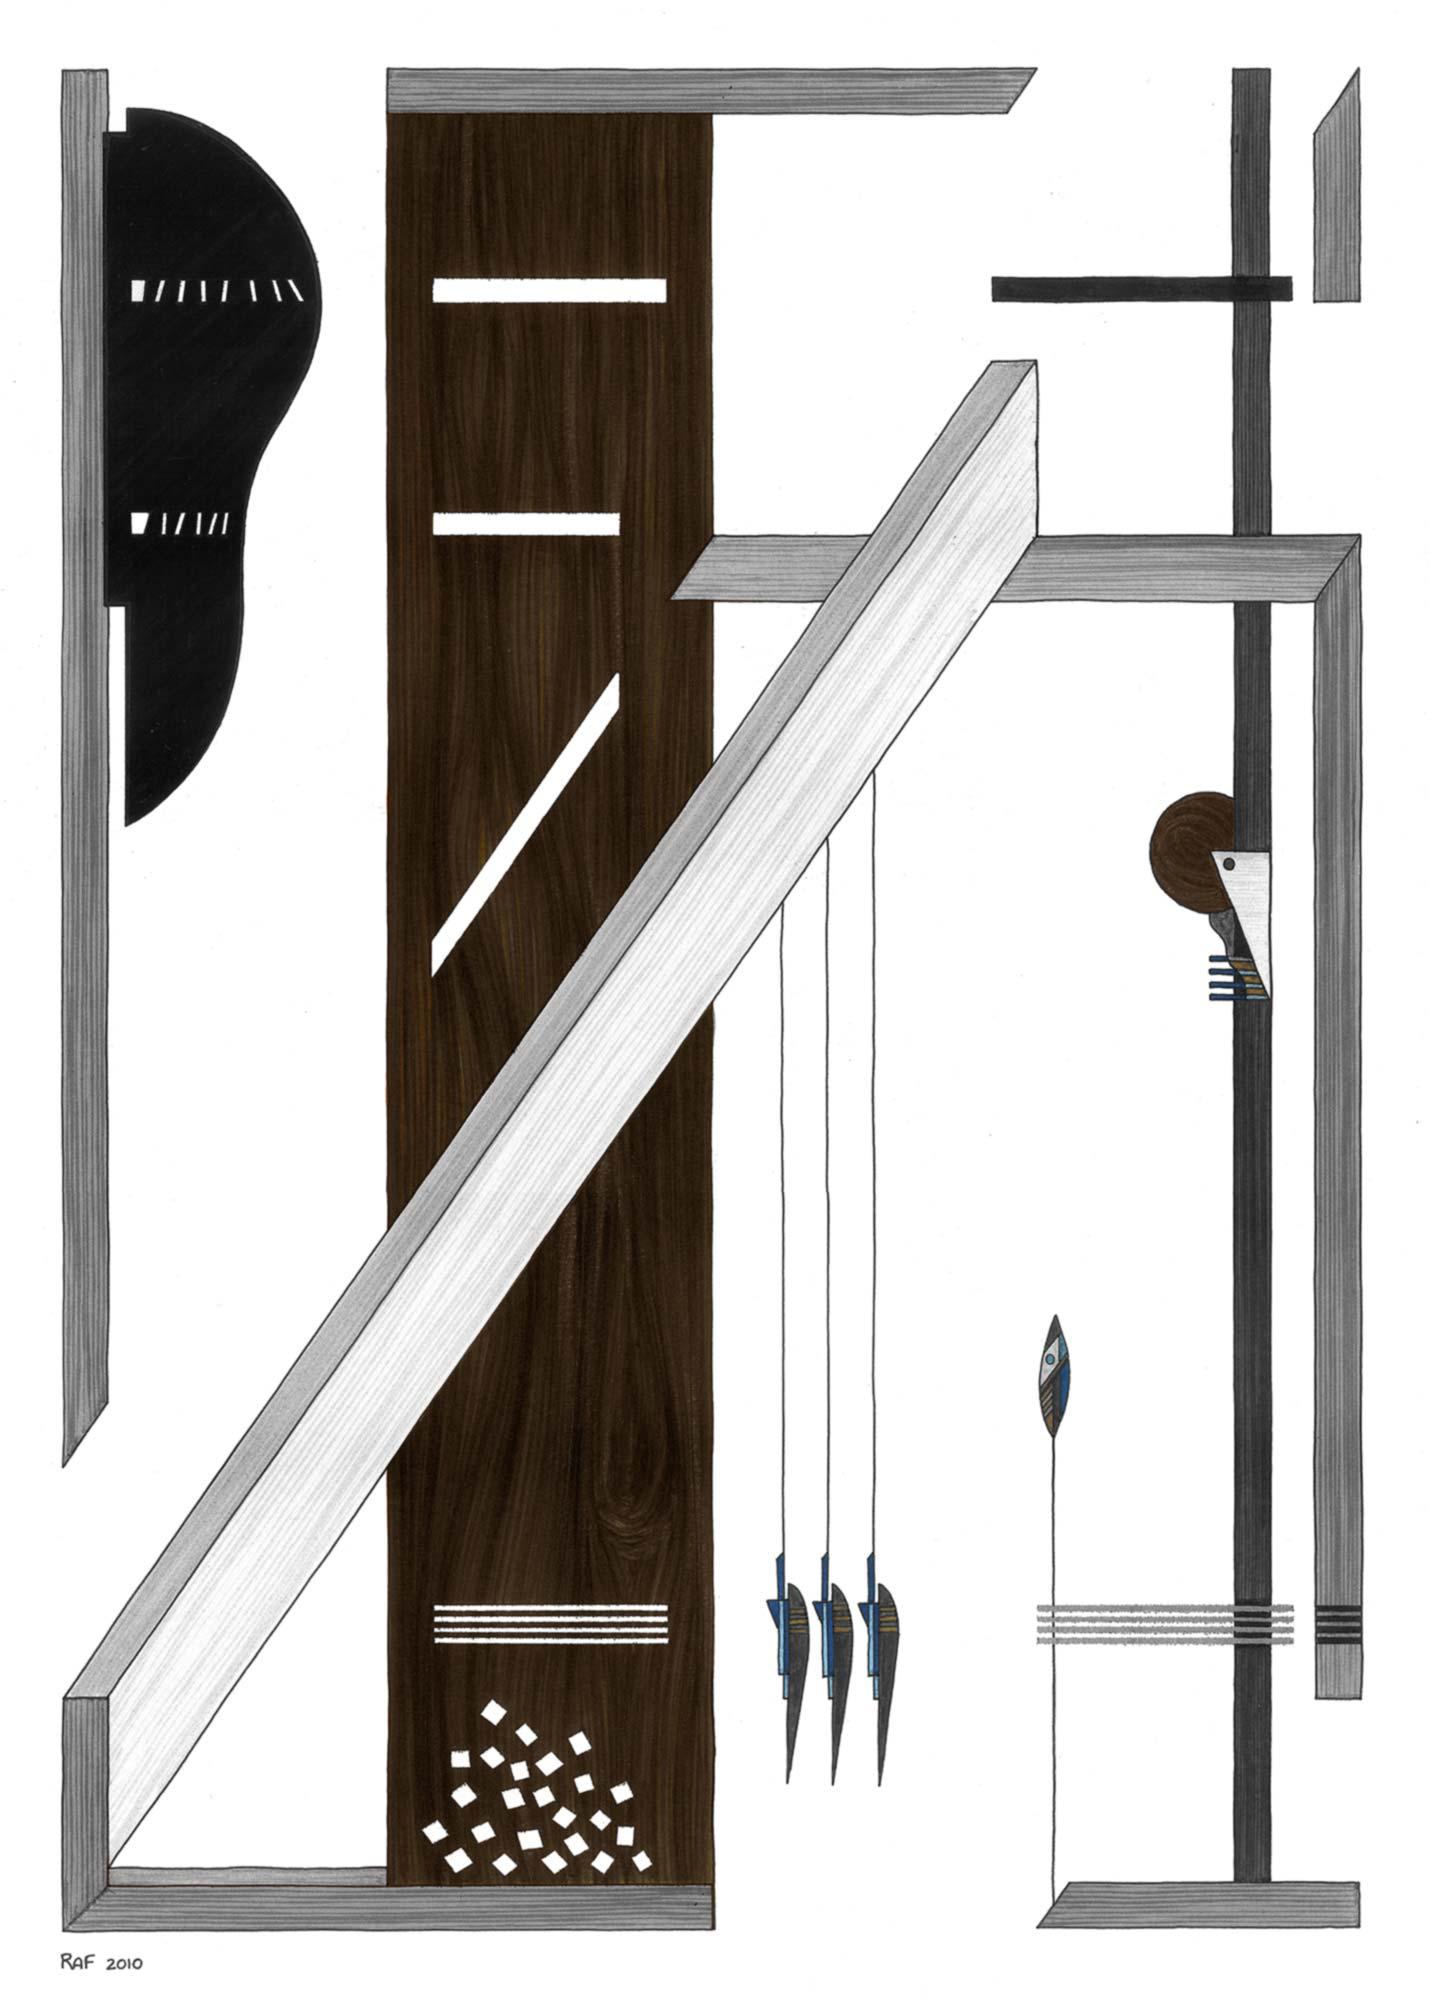 La toise, dessin, Raf Listowski, 2010